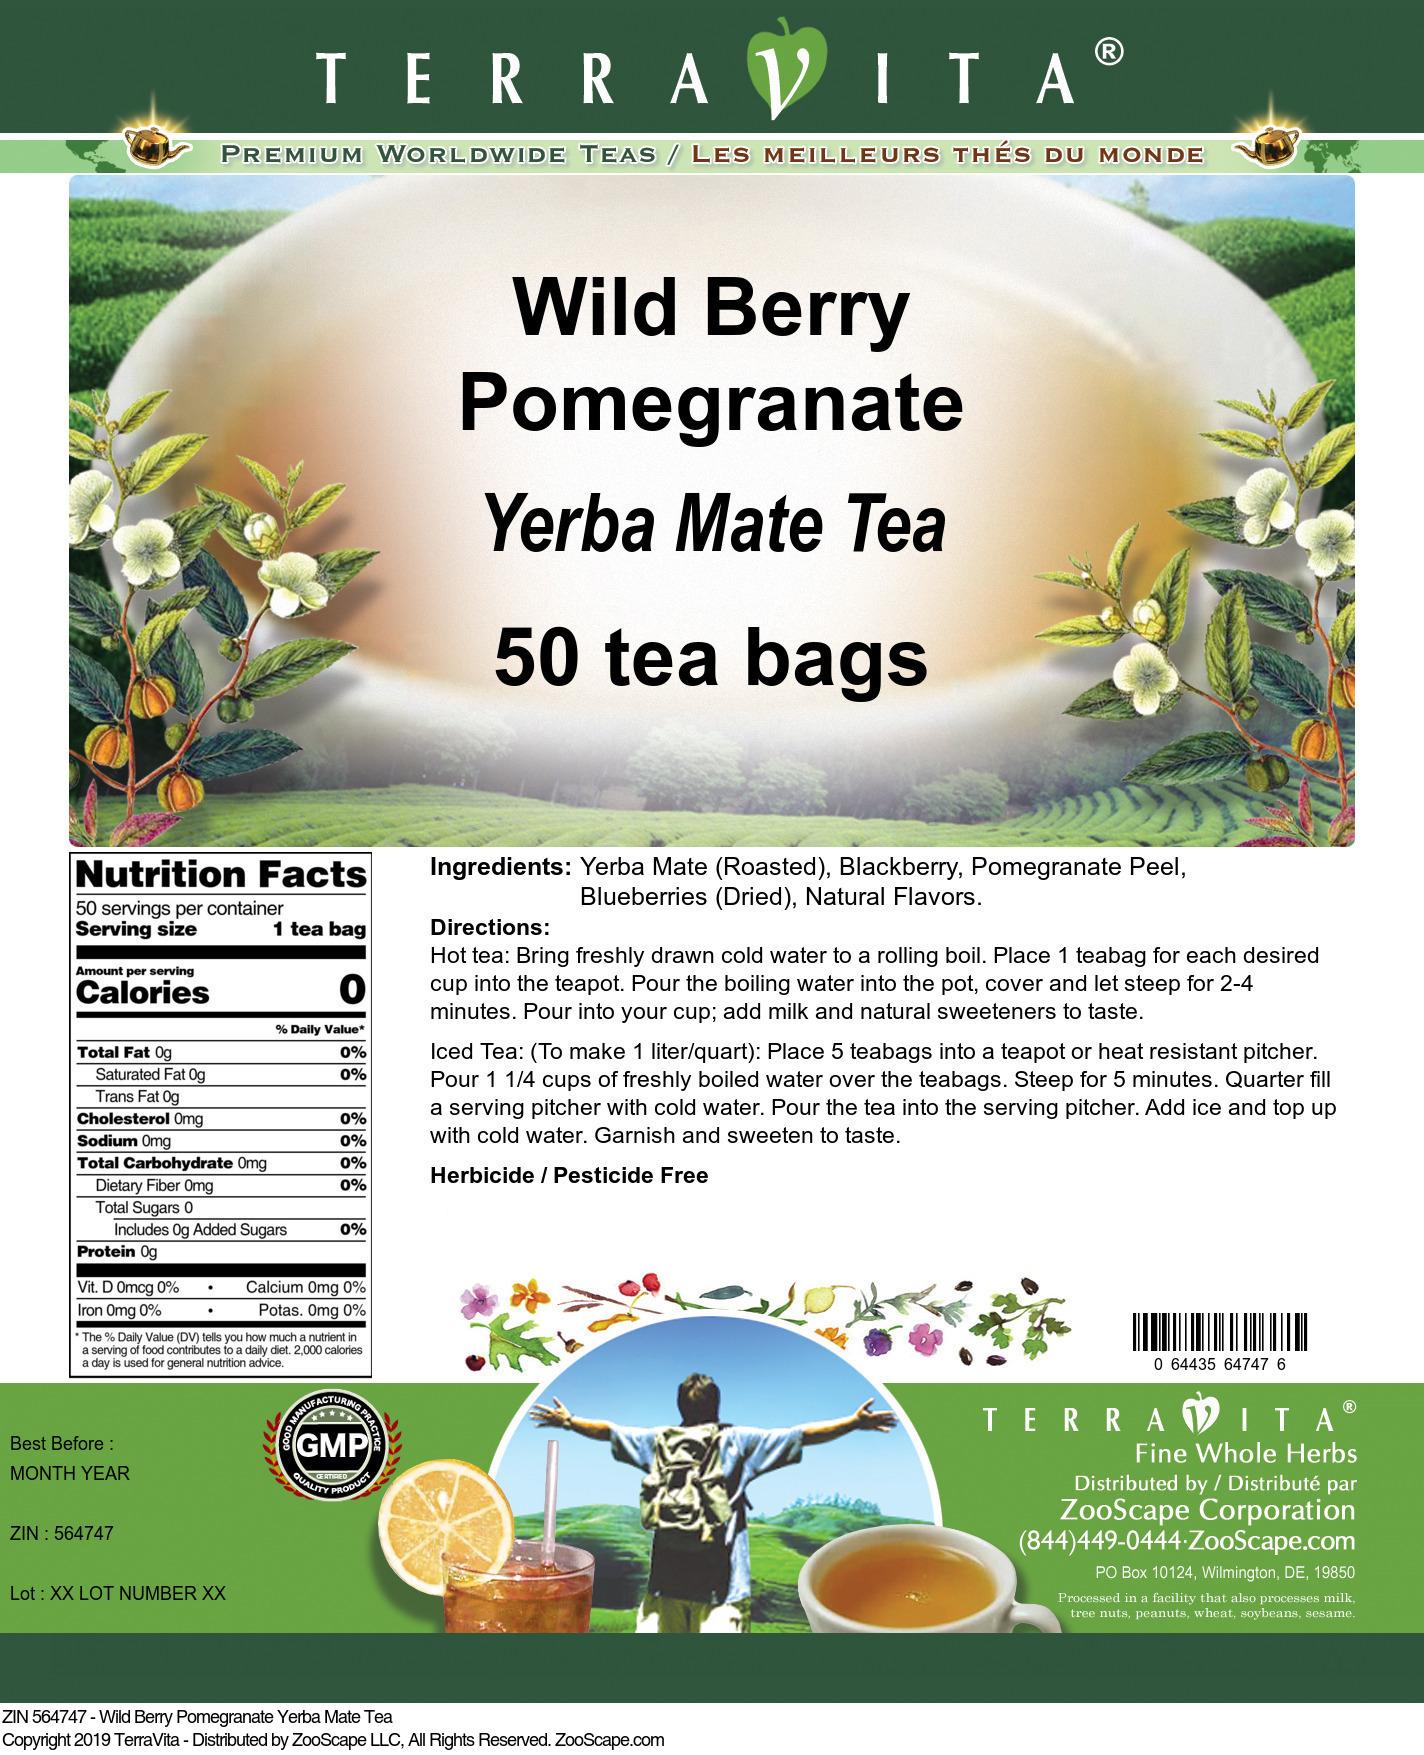 Wild Berry Pomegranate Yerba Mate Tea